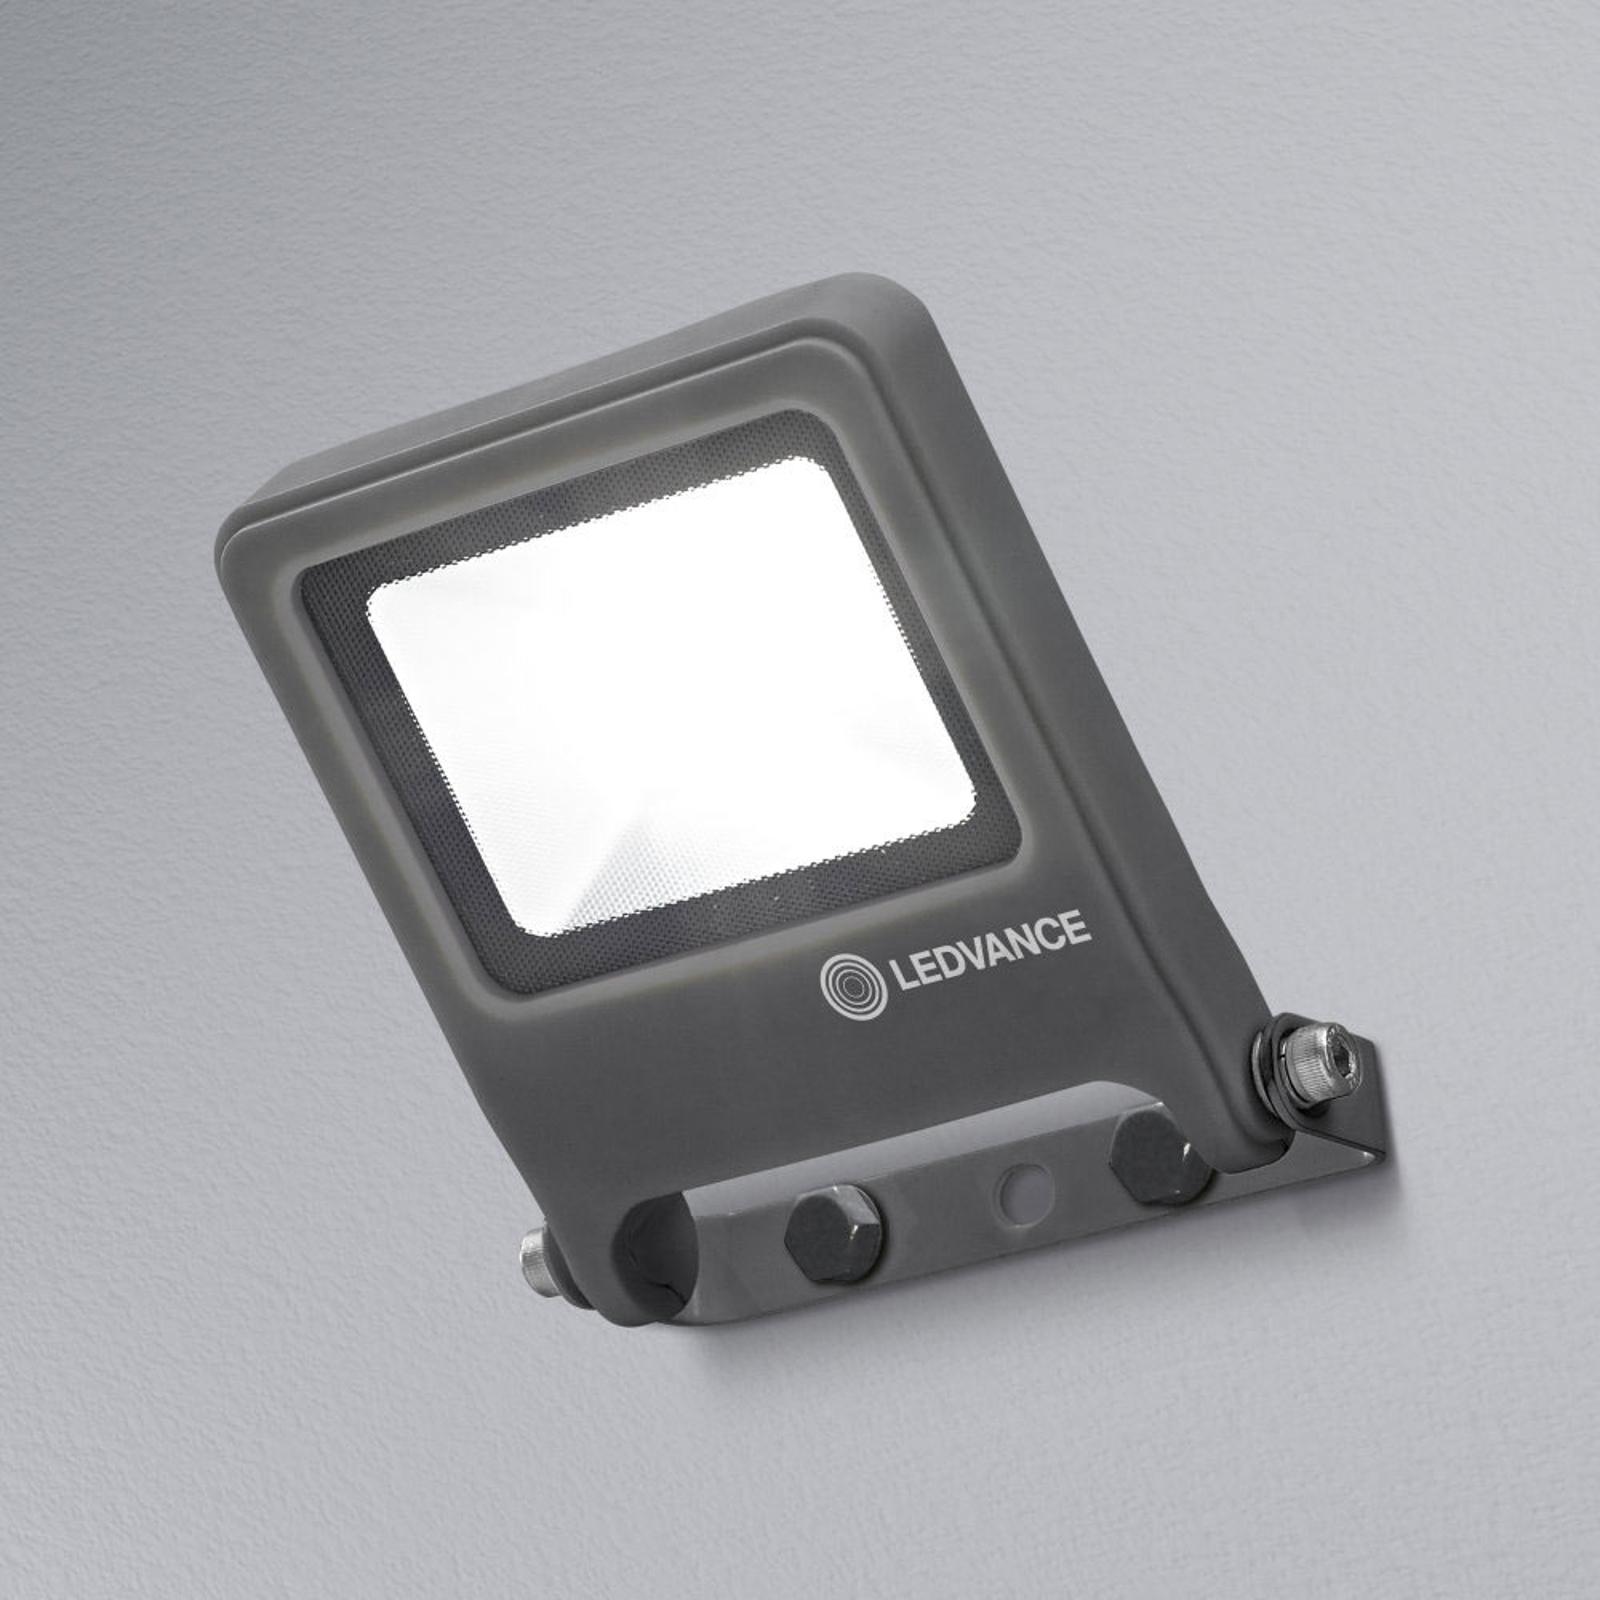 LEDVANCE Endura Floodlight LED-kohdevalaisin 10W